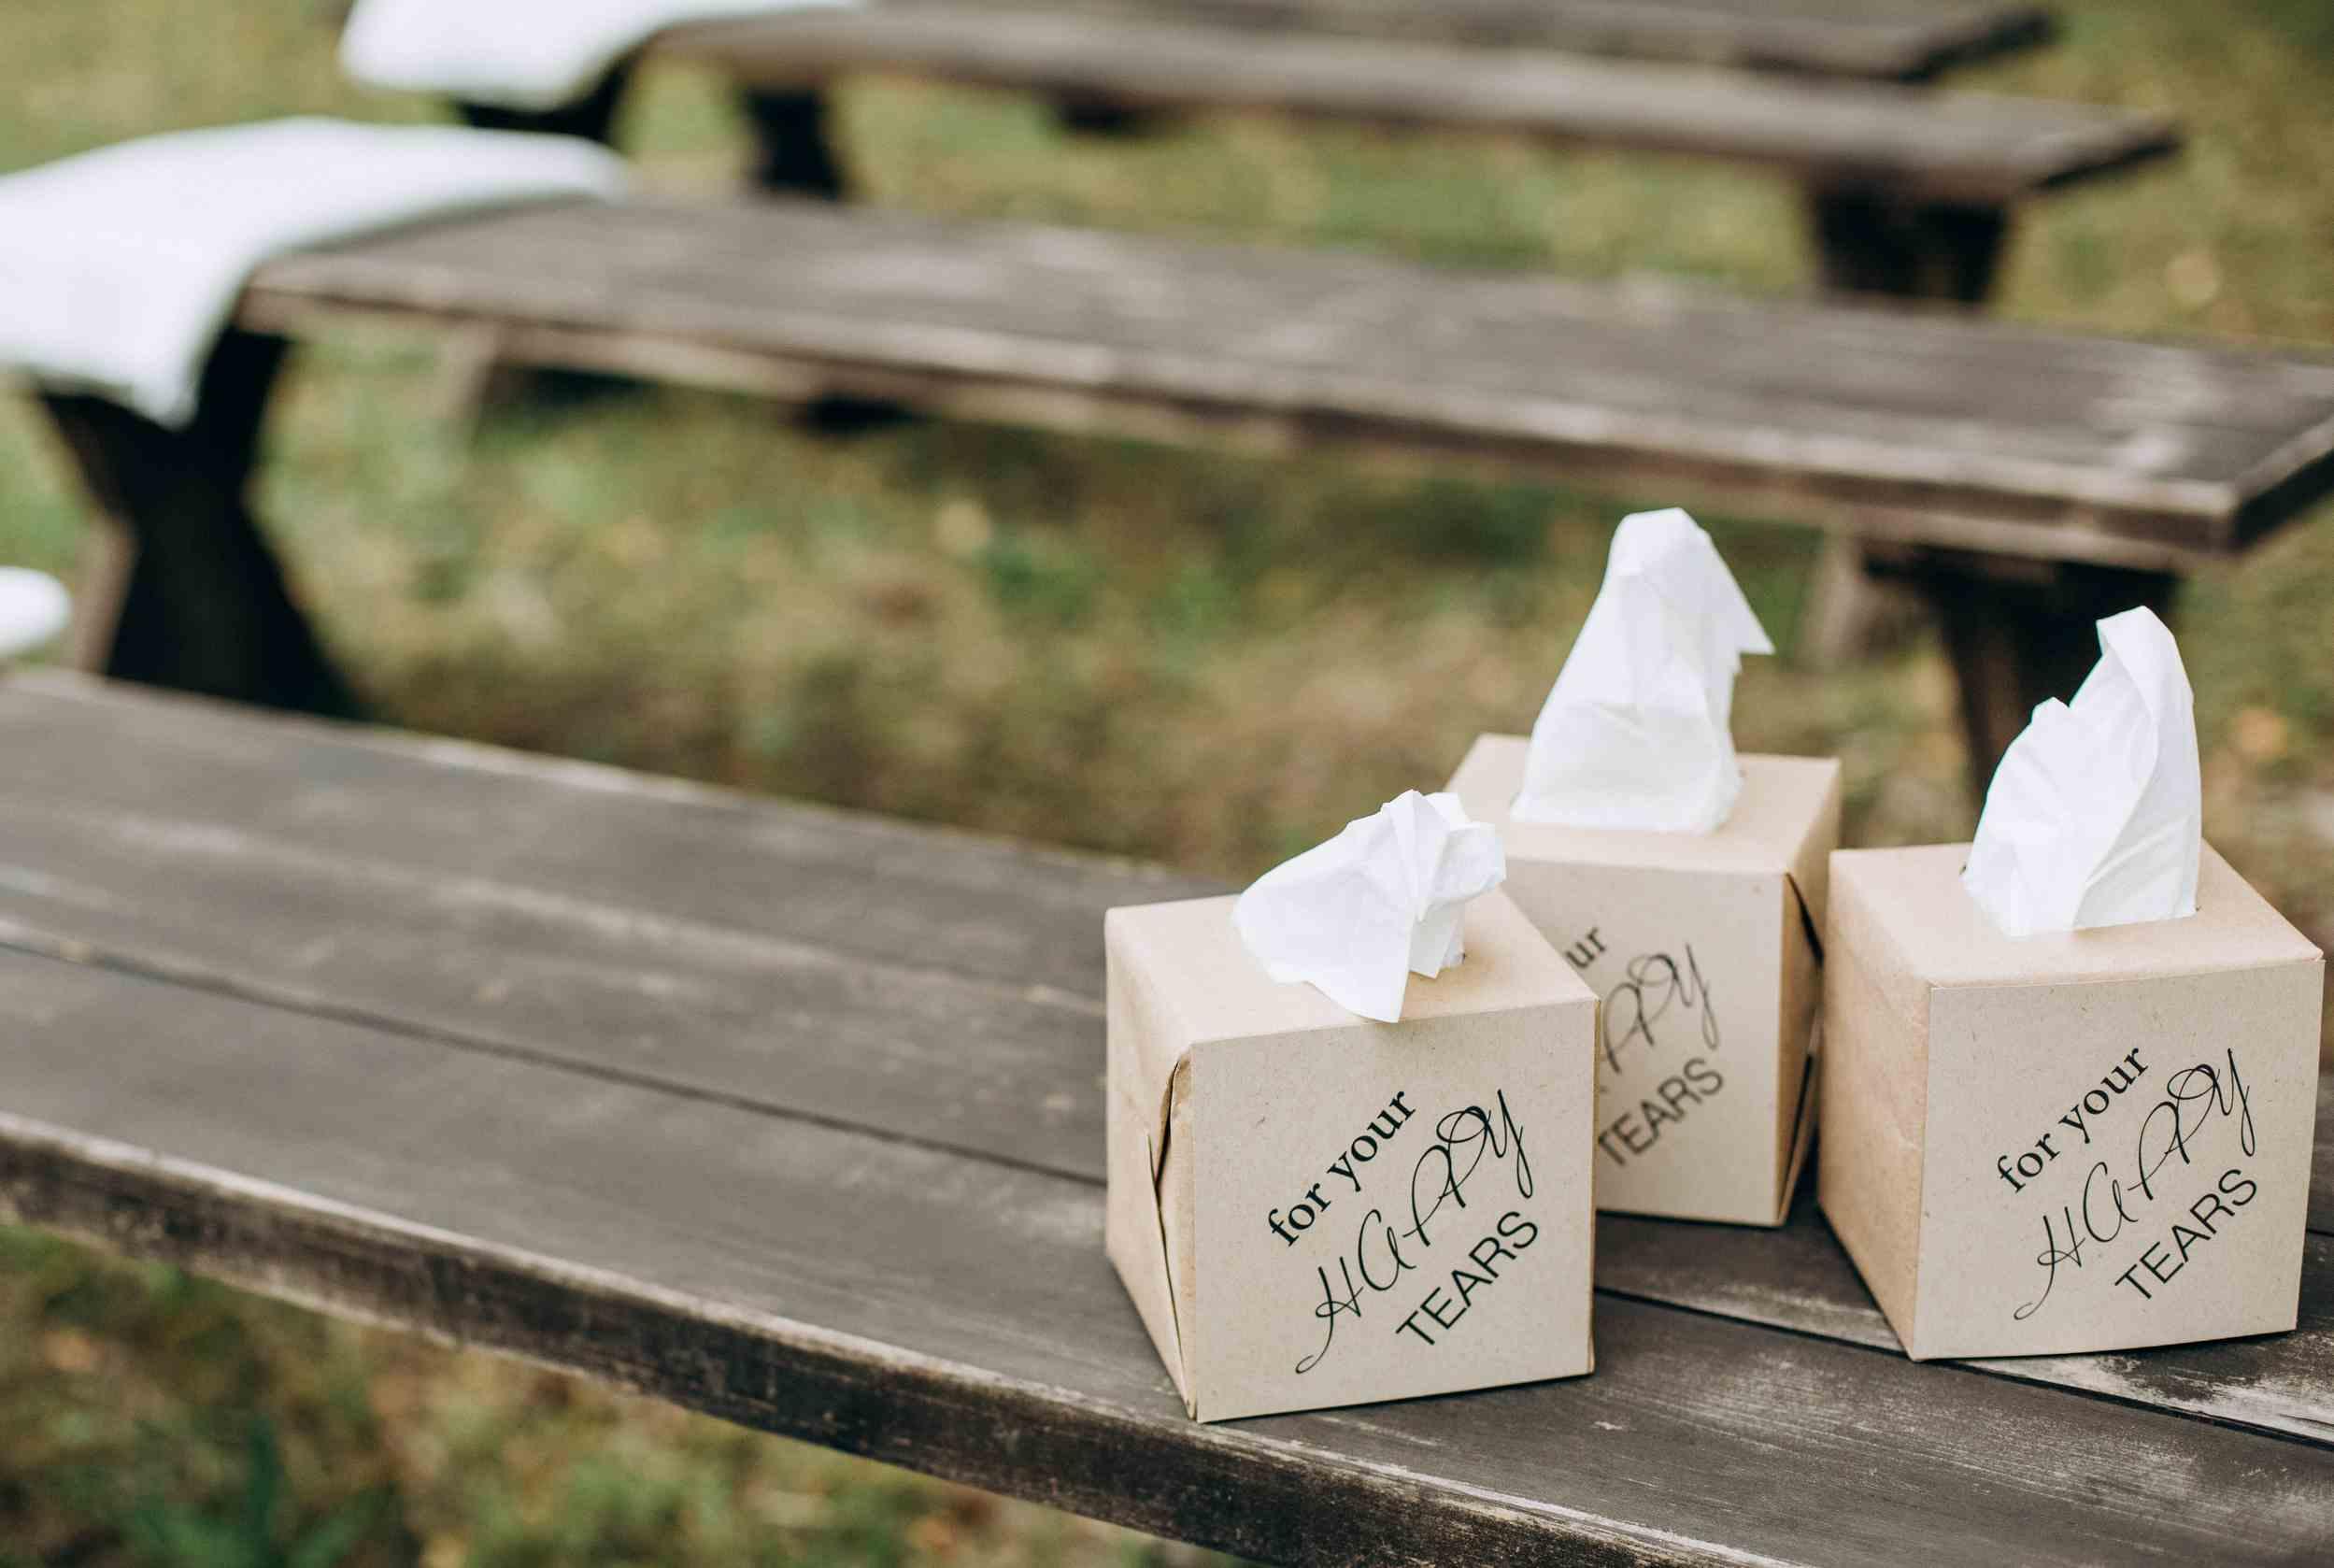 платочки для слез на церемонии, идея